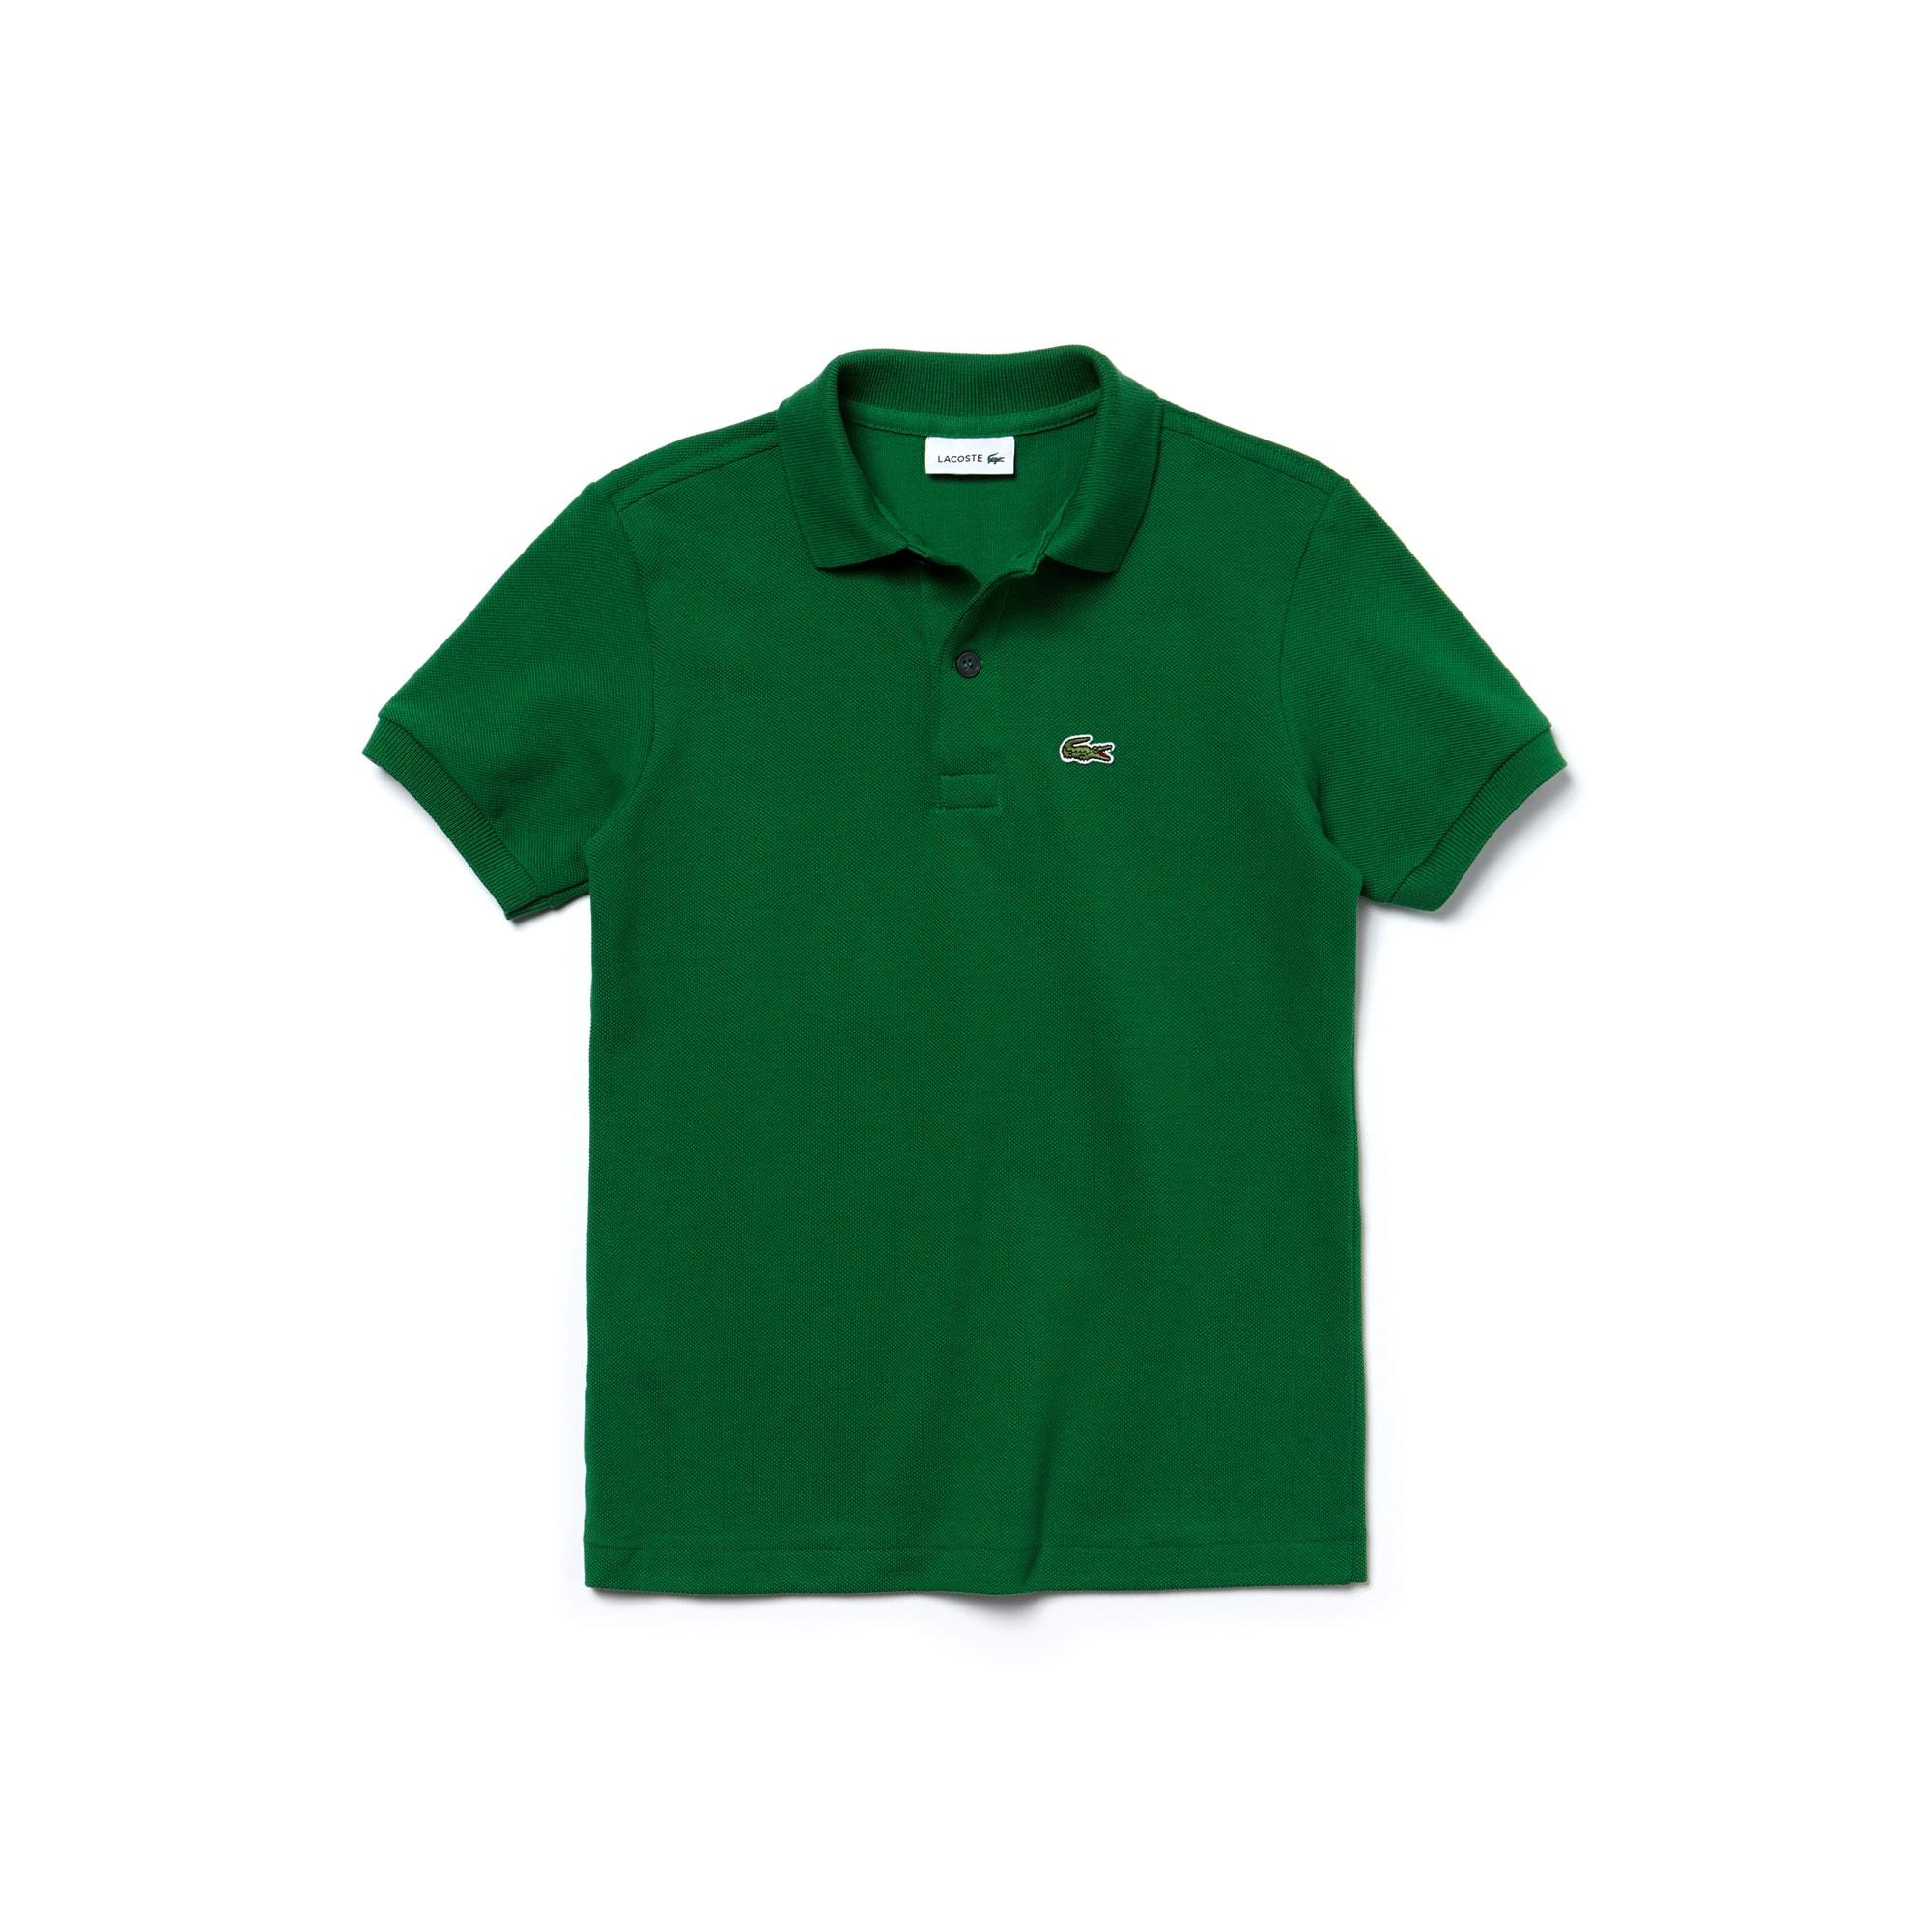 c51241a483 All Kids items | Sale | LACOSTE